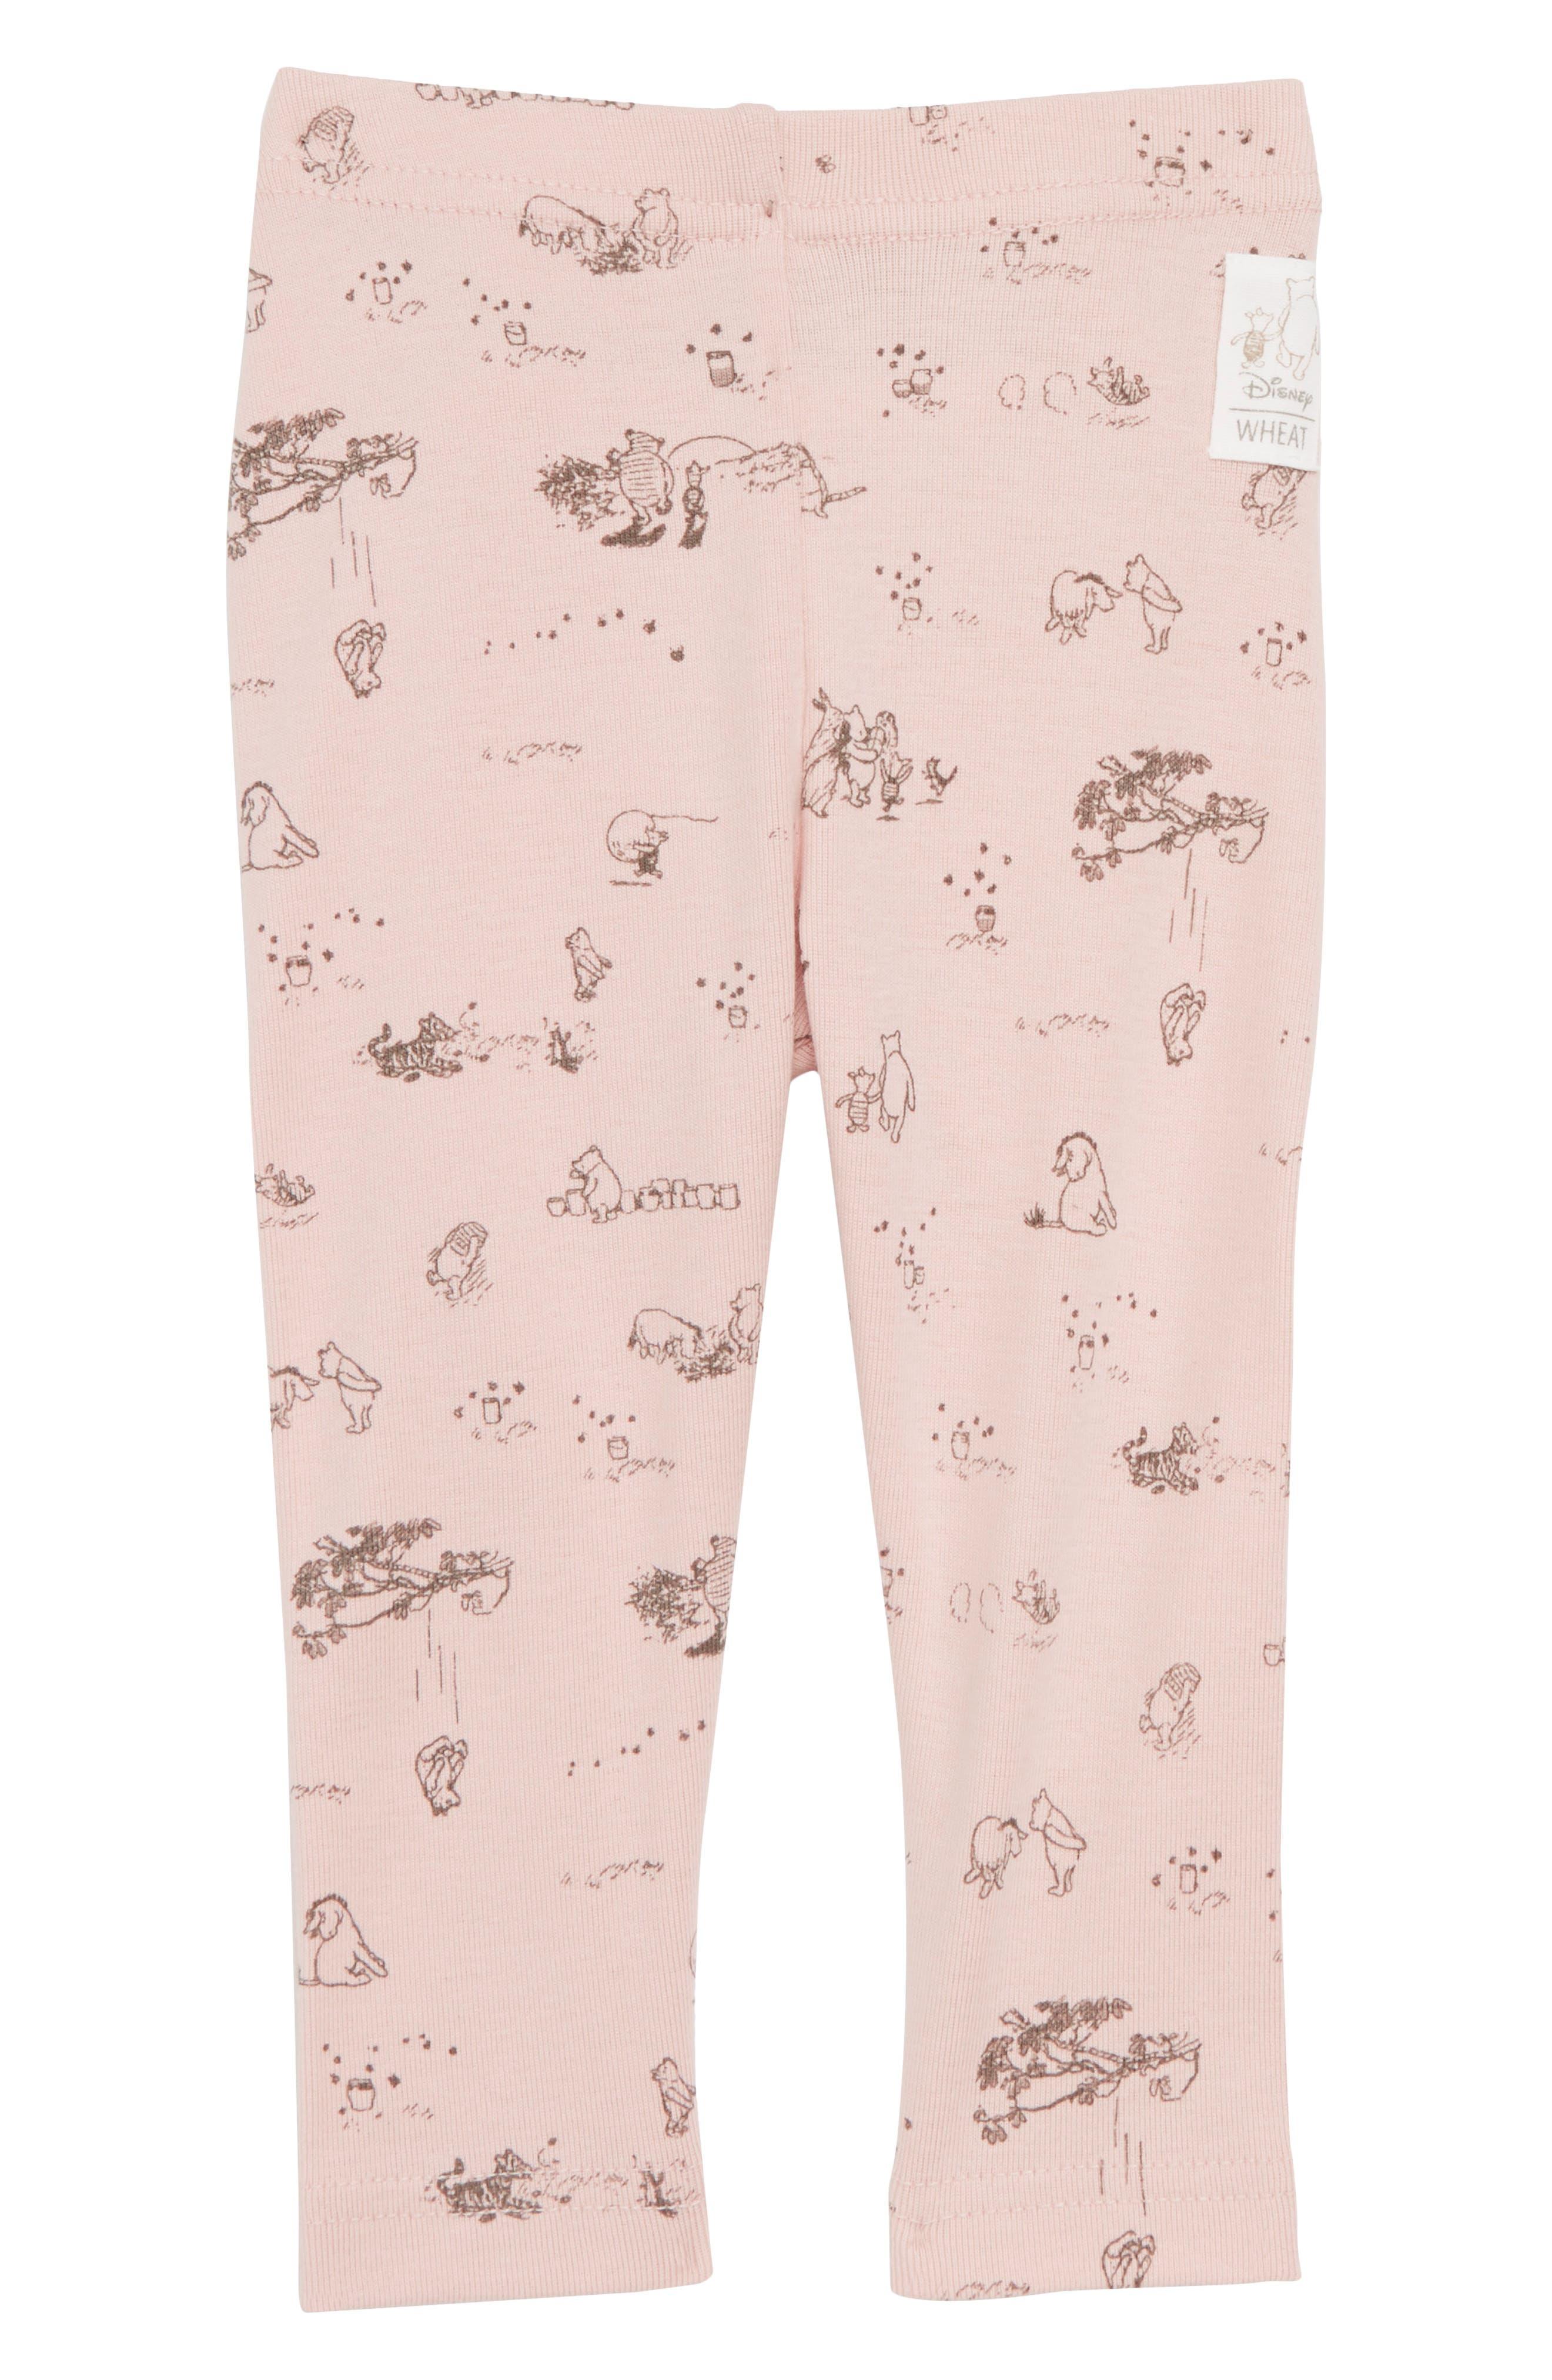 x Disney<sup>®</sup> Winnie the Pooh Organic Cotton Leggings,                             Main thumbnail 1, color,                             Powder